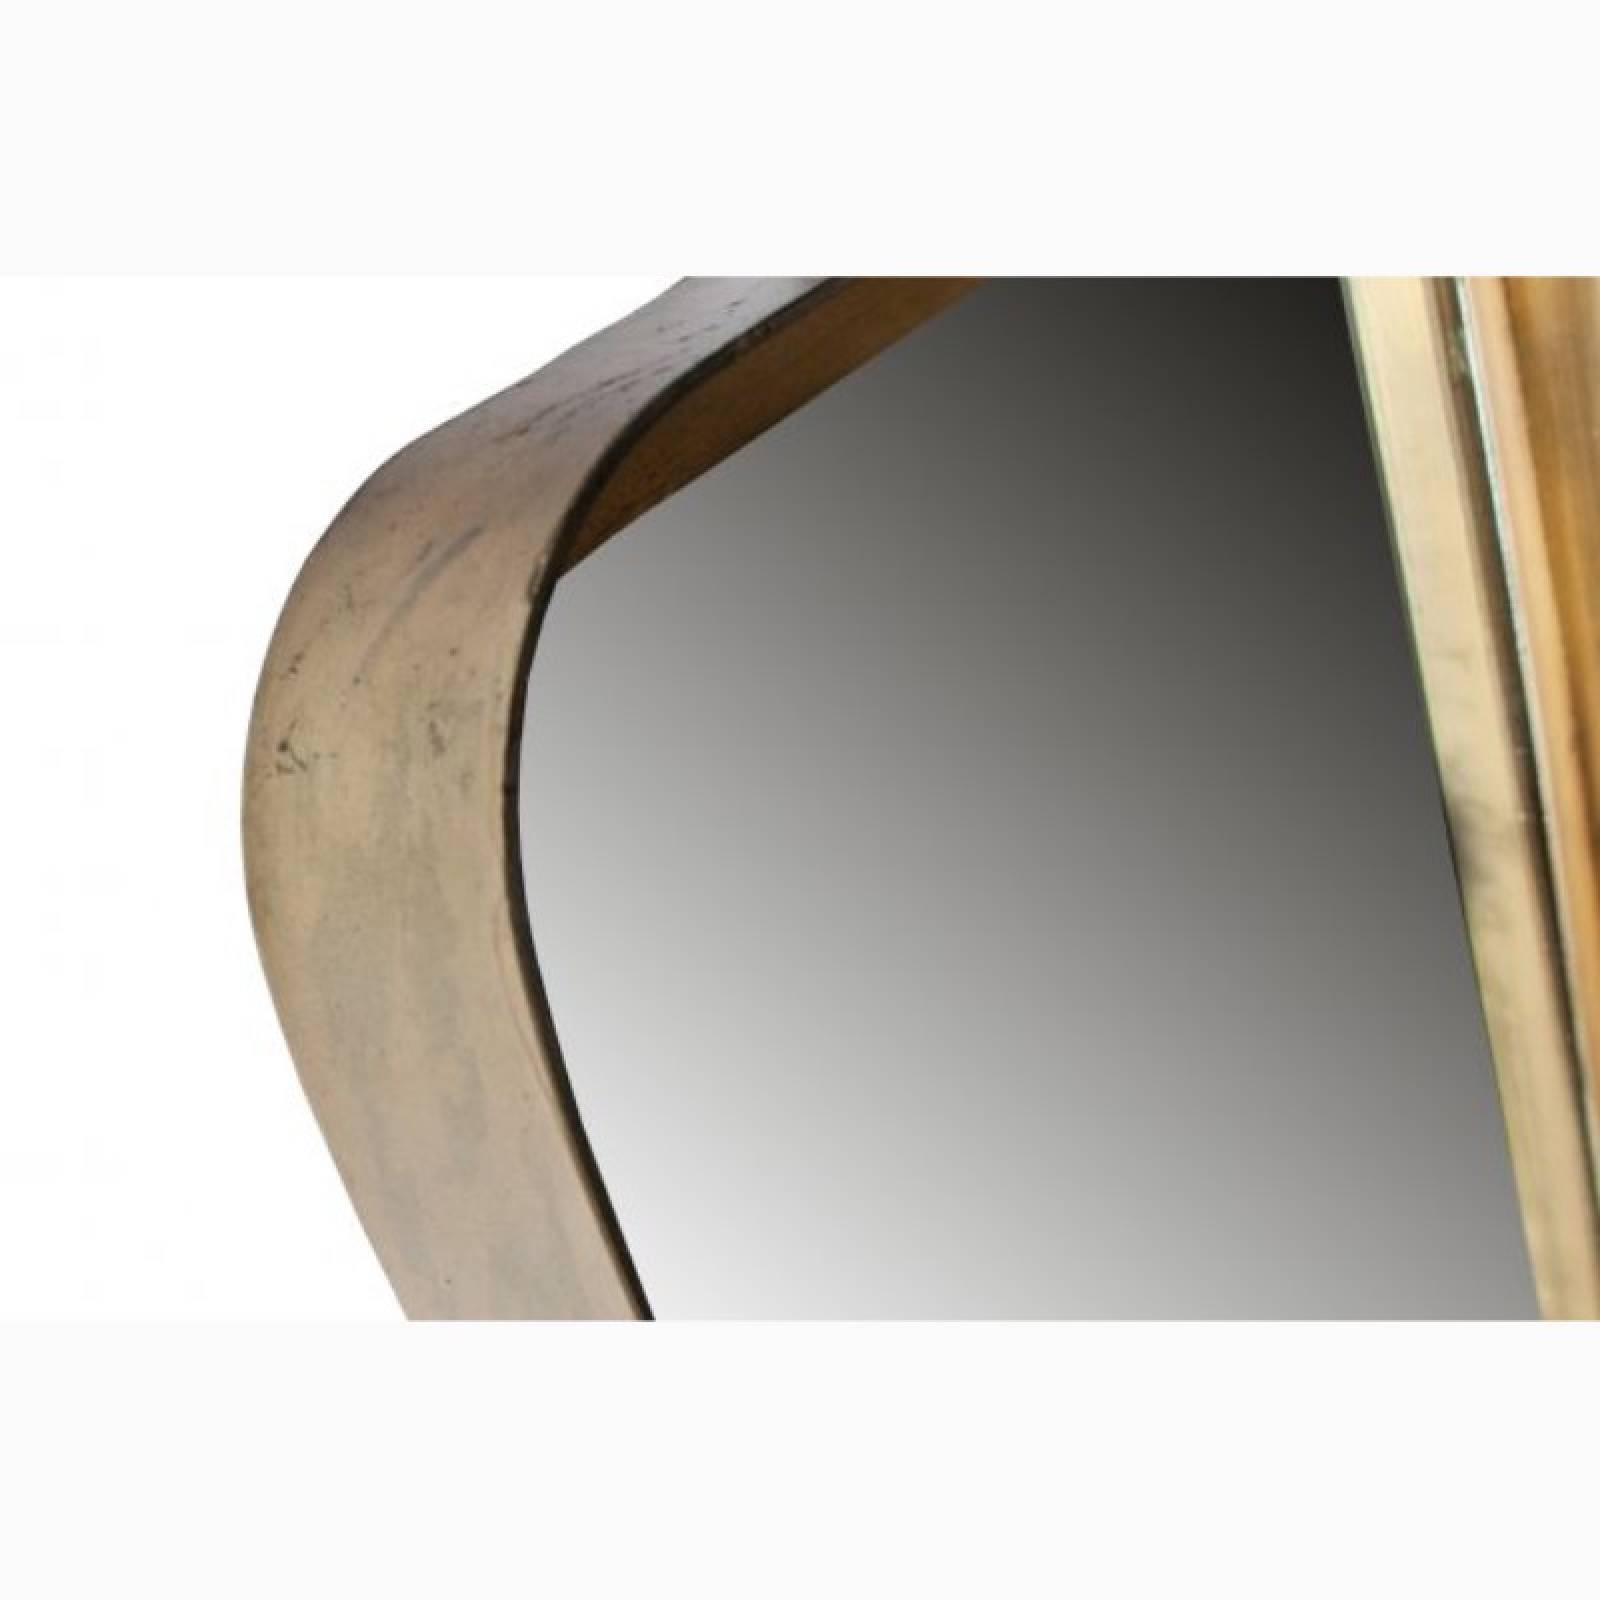 Slim Long Gold Rectangular Mirror L:145cm thumbnails